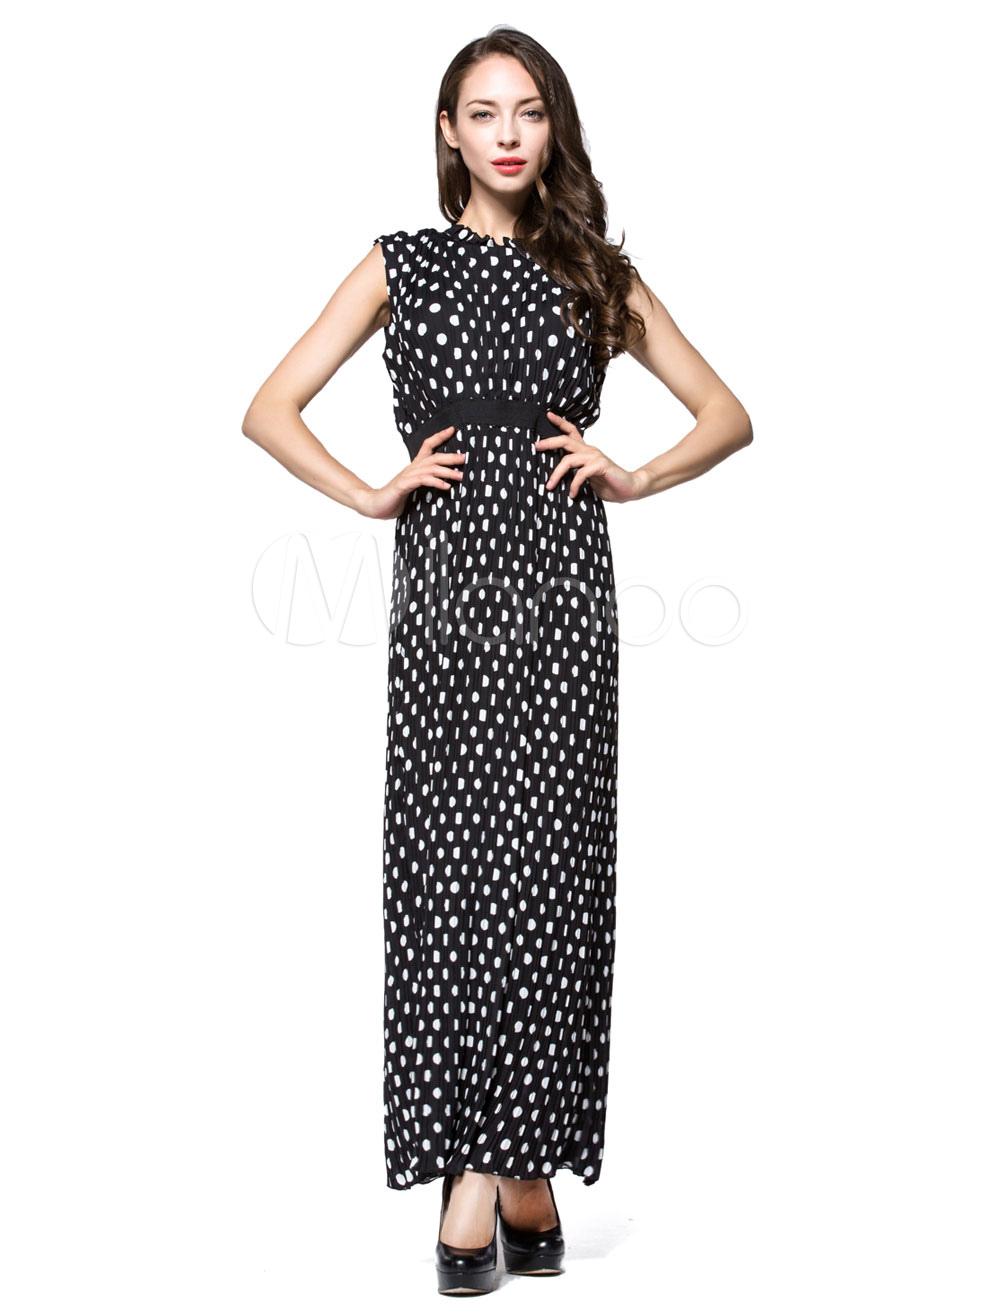 d7cc475f1a538 Vintage Maxi Dress Women's Plus Size Chiffon Polka Dot Embellished Collar  Sleeveless Retro Long Dress